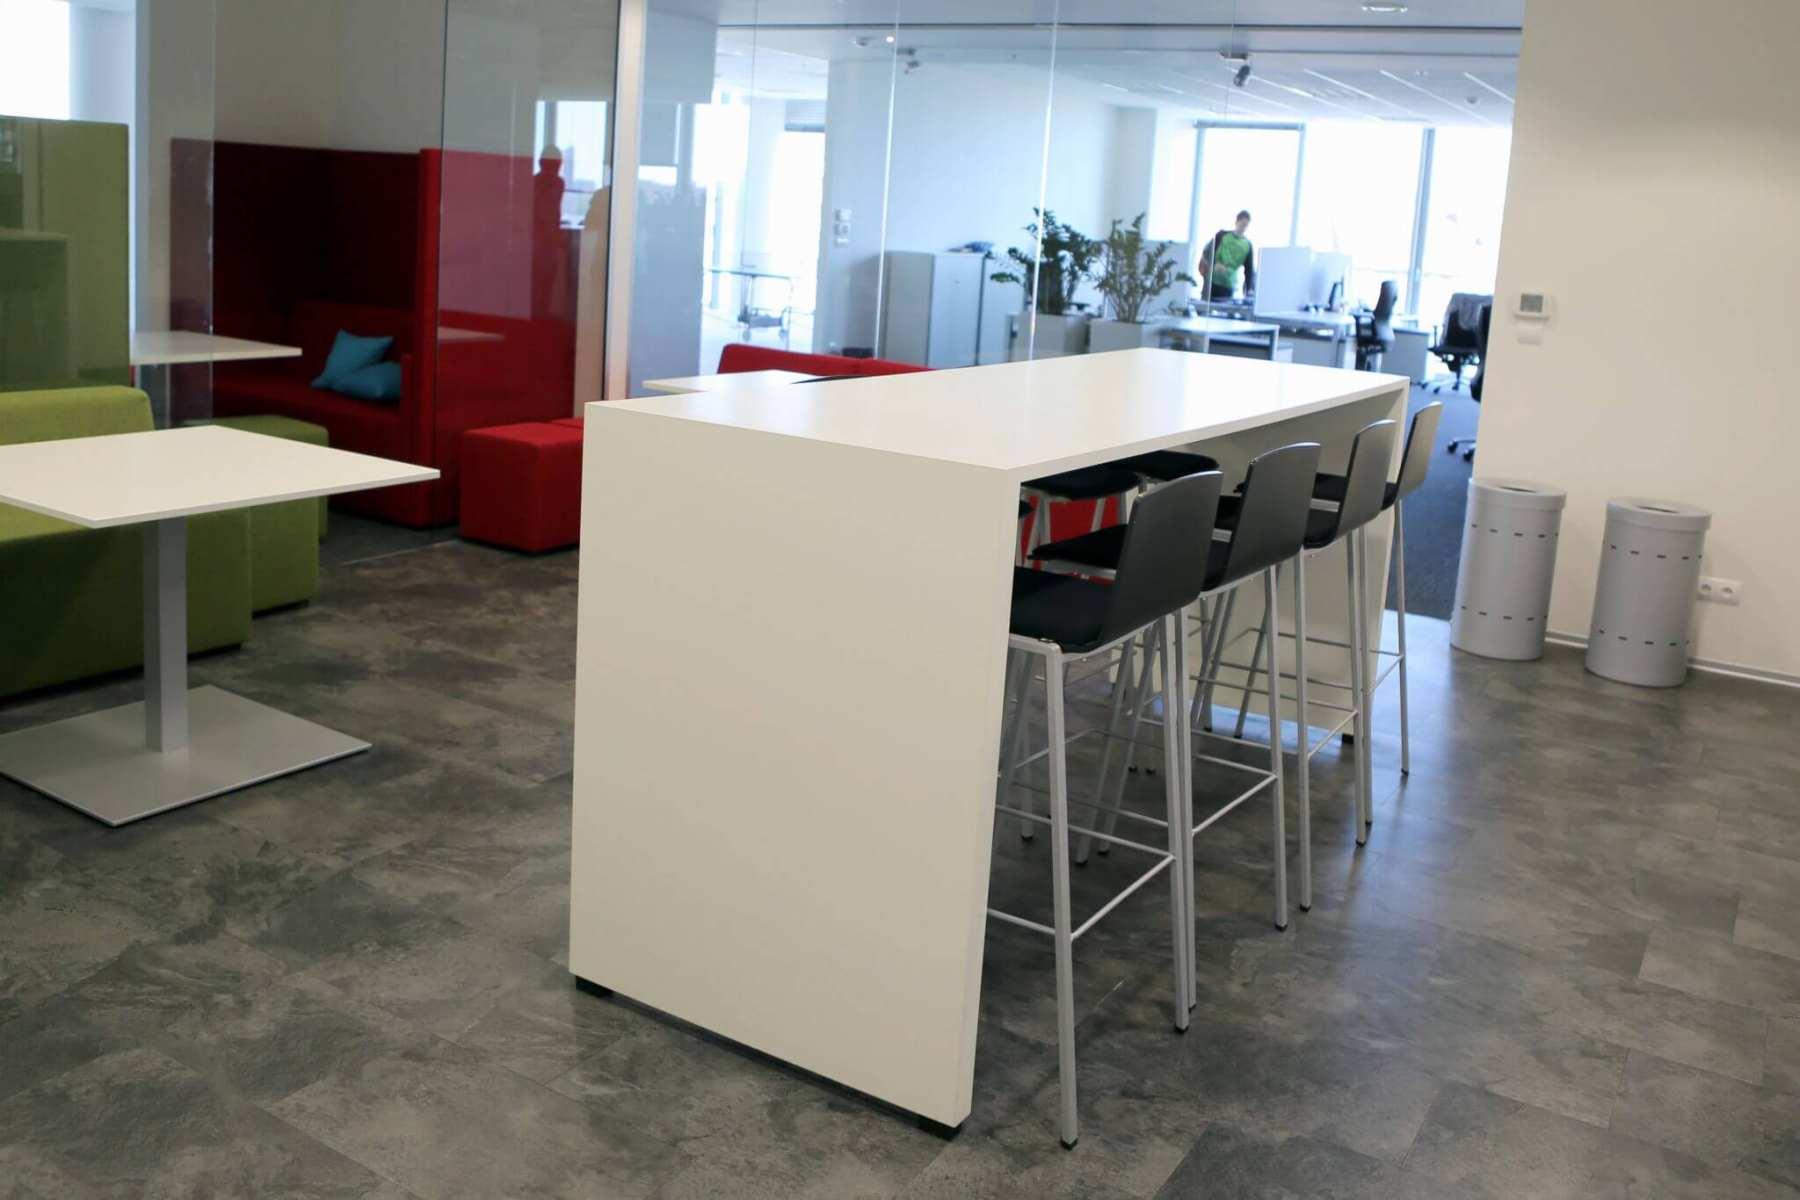 Linde Global IT Services Bratislava